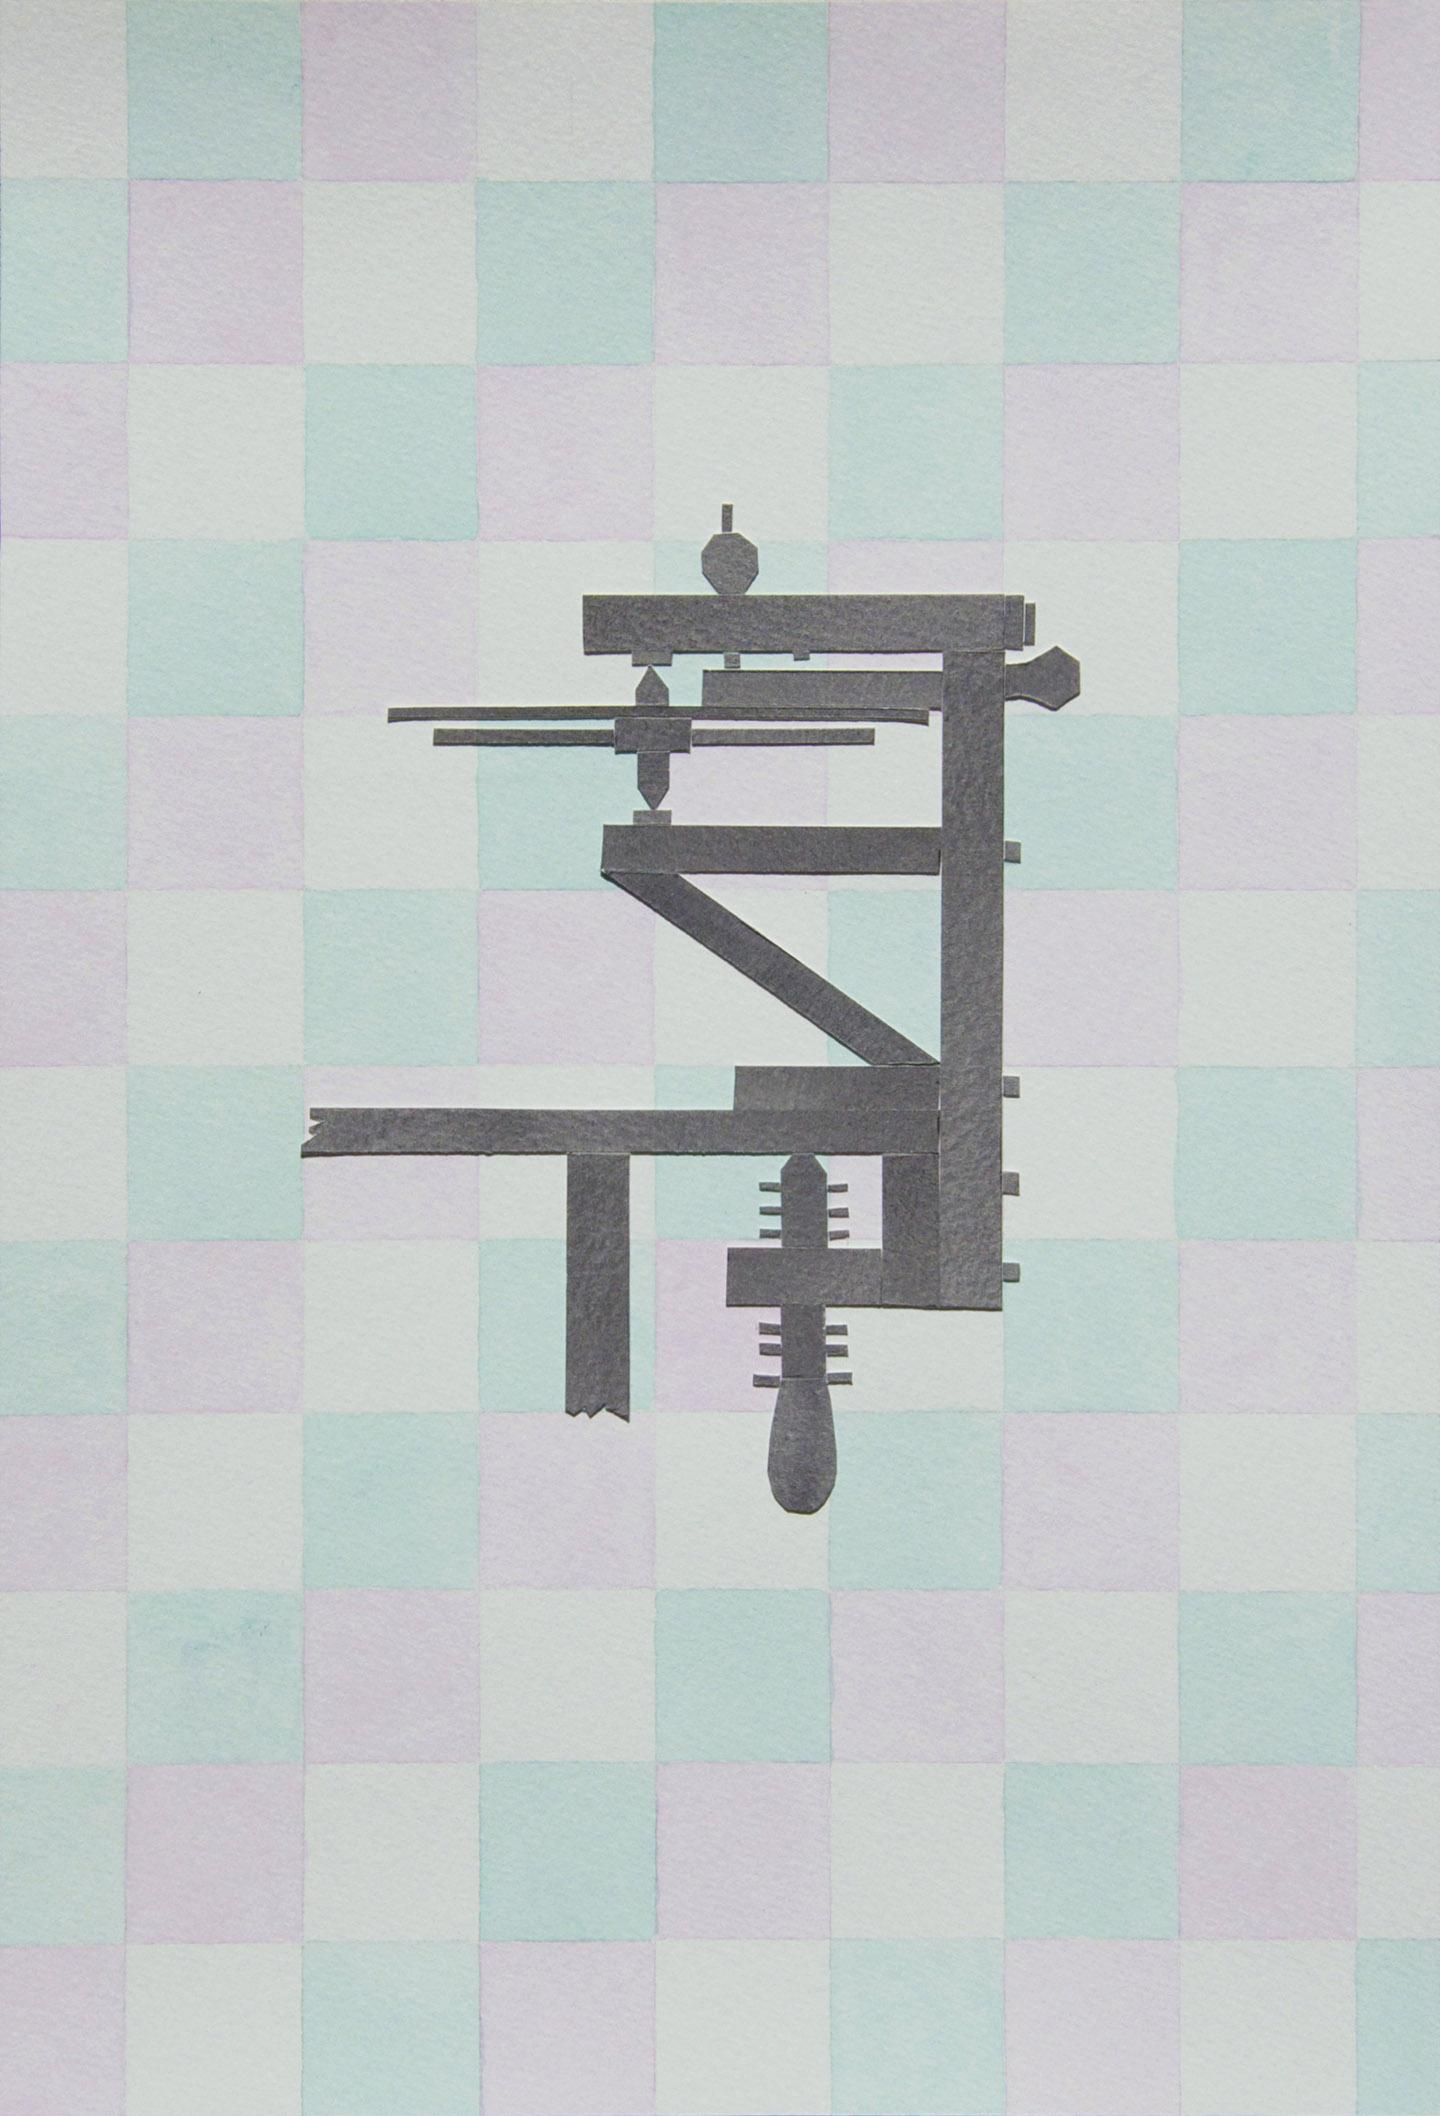 Prototype Apparatus I